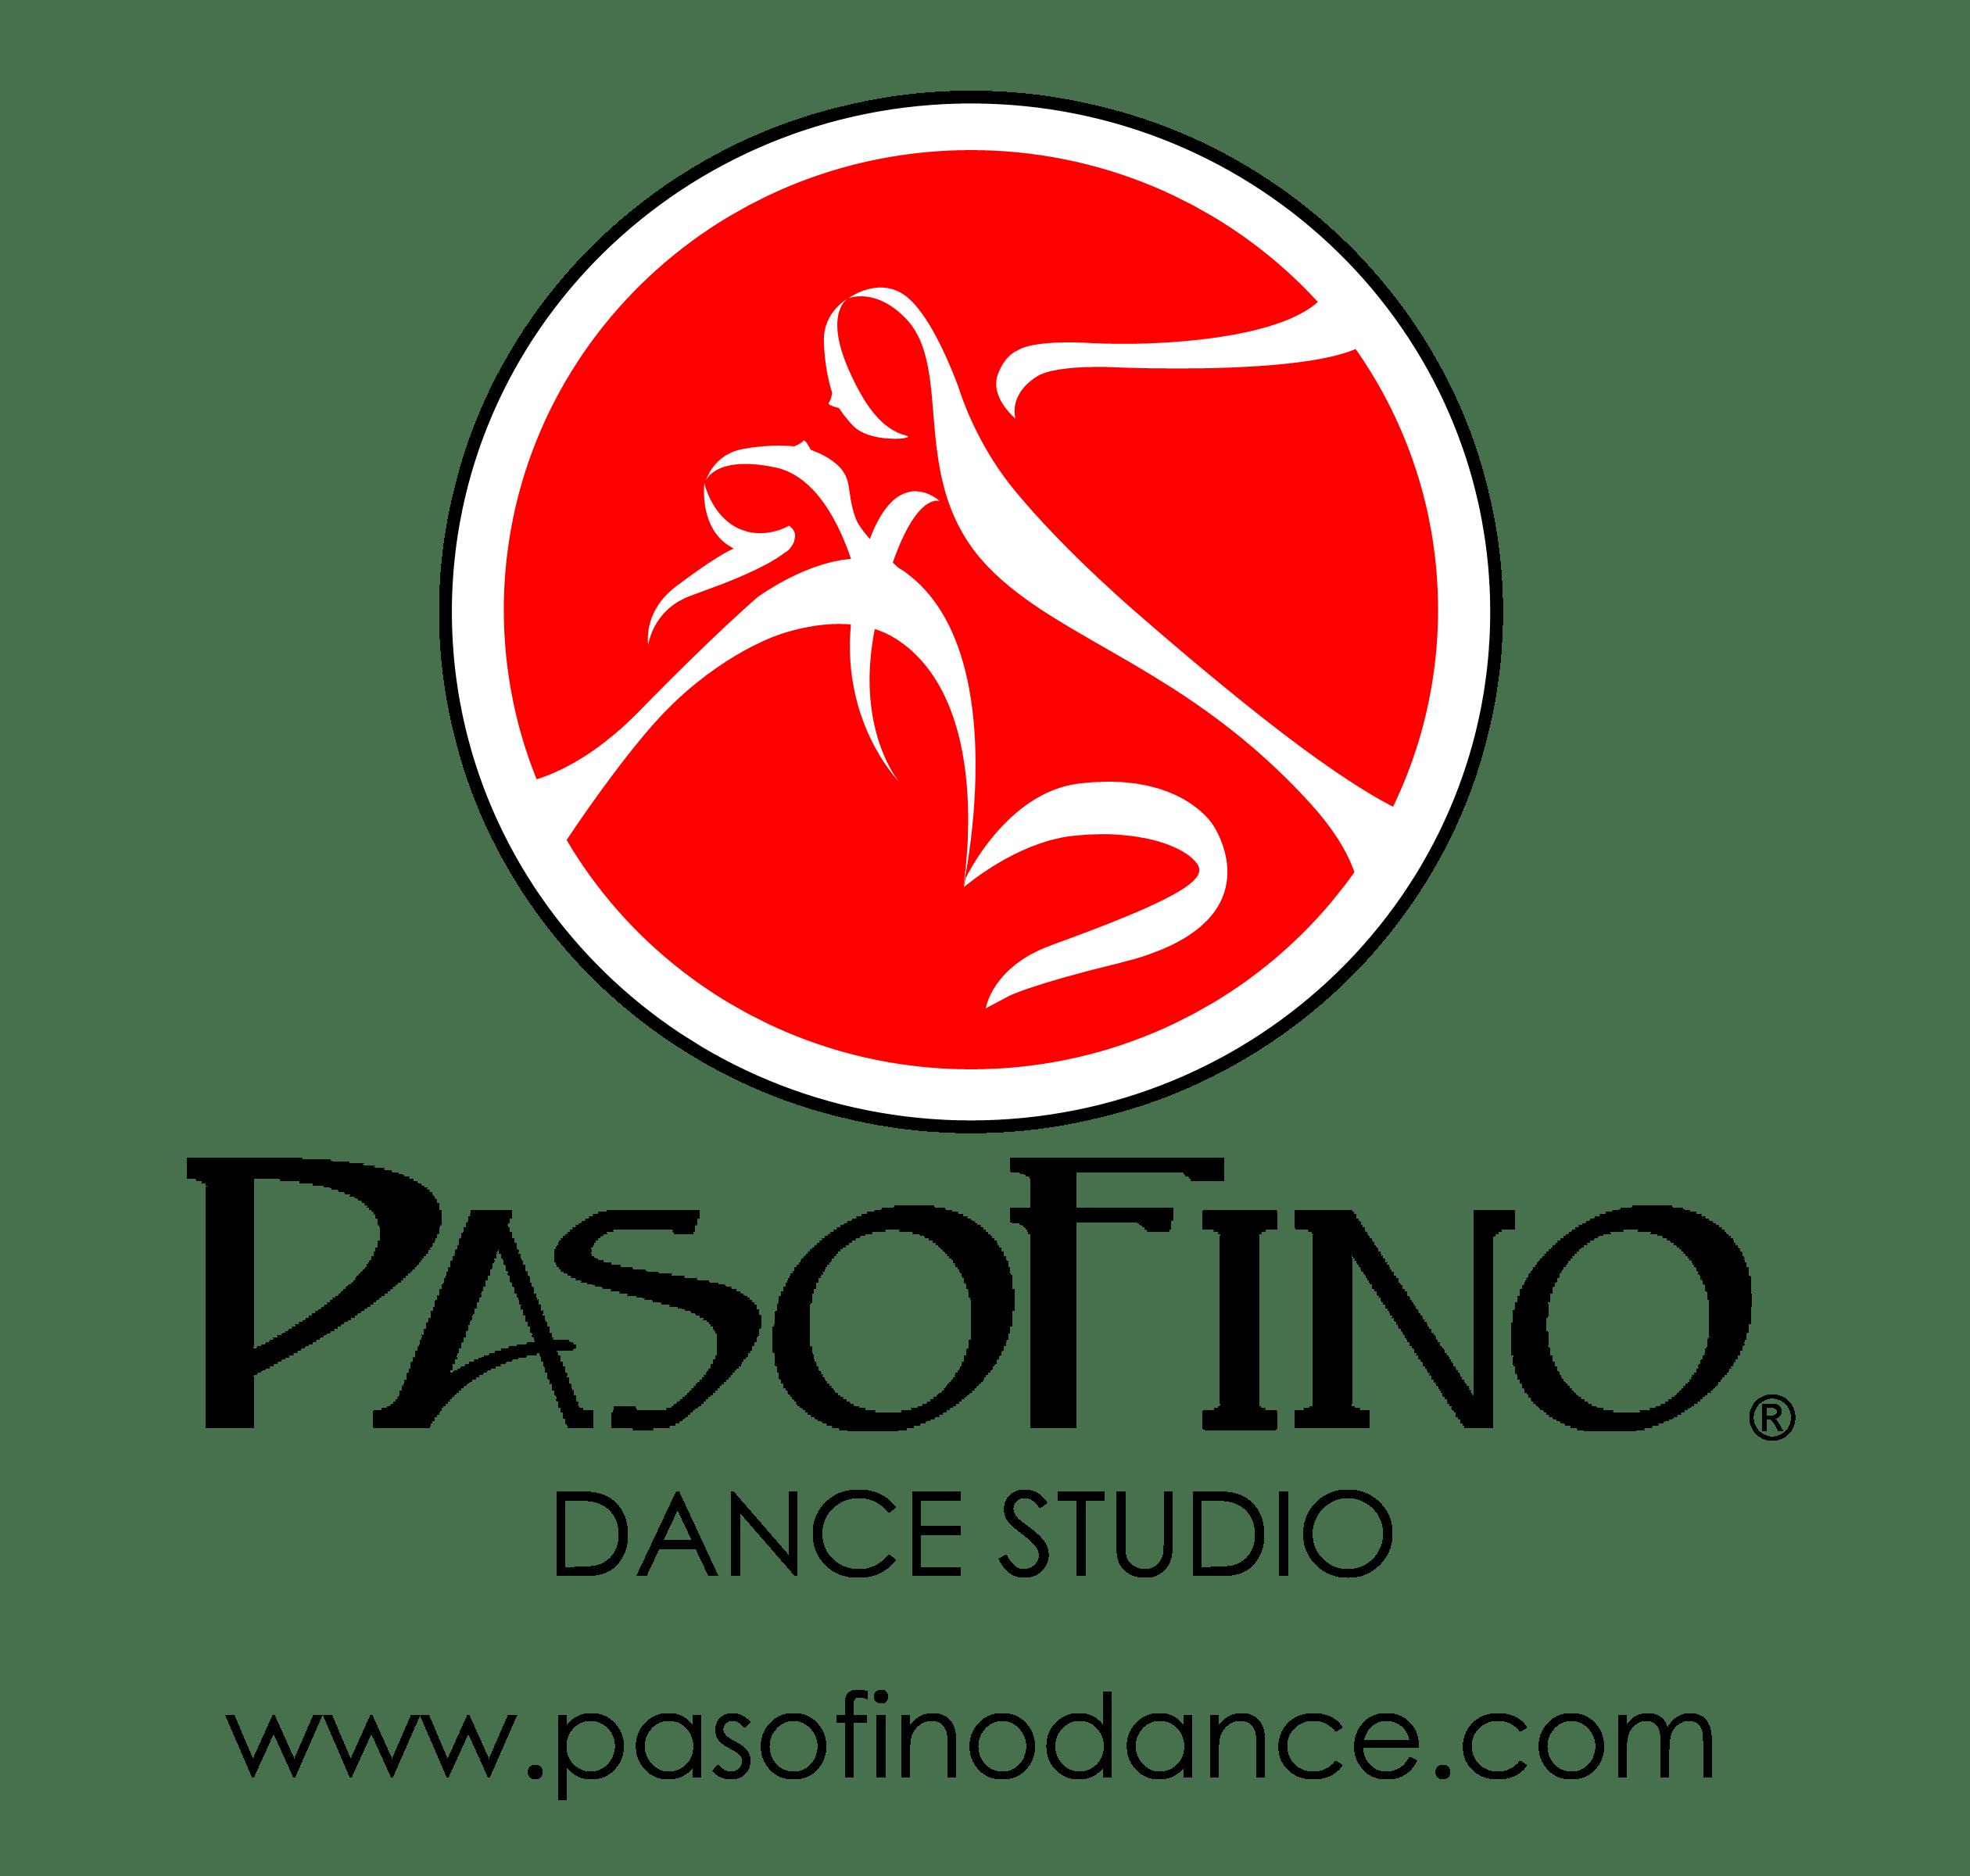 PasoFino Studio Logo